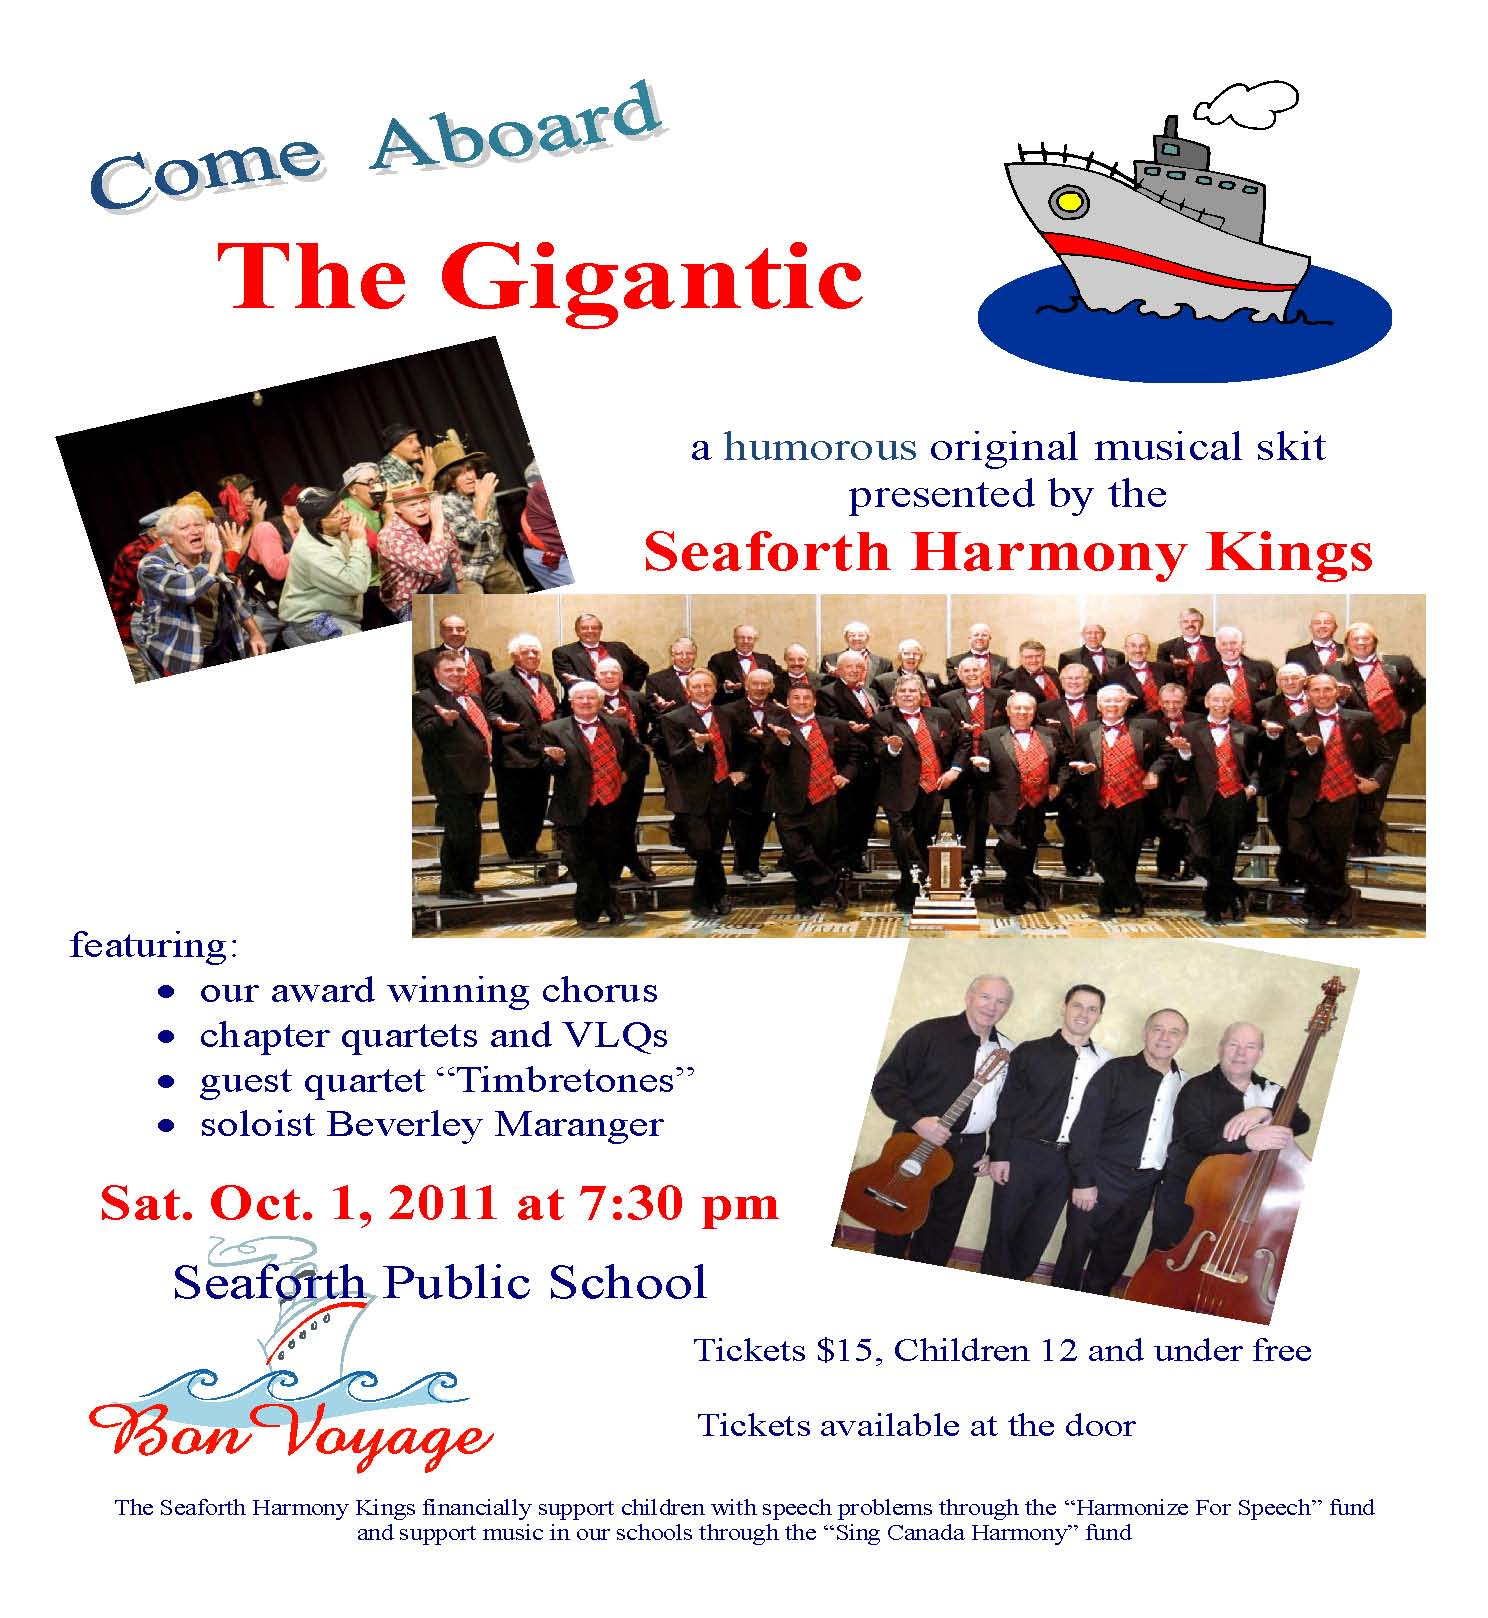 1b299-seaforth_harmony_kings_2011_poster_gigantic_tickets_at_door.jpg